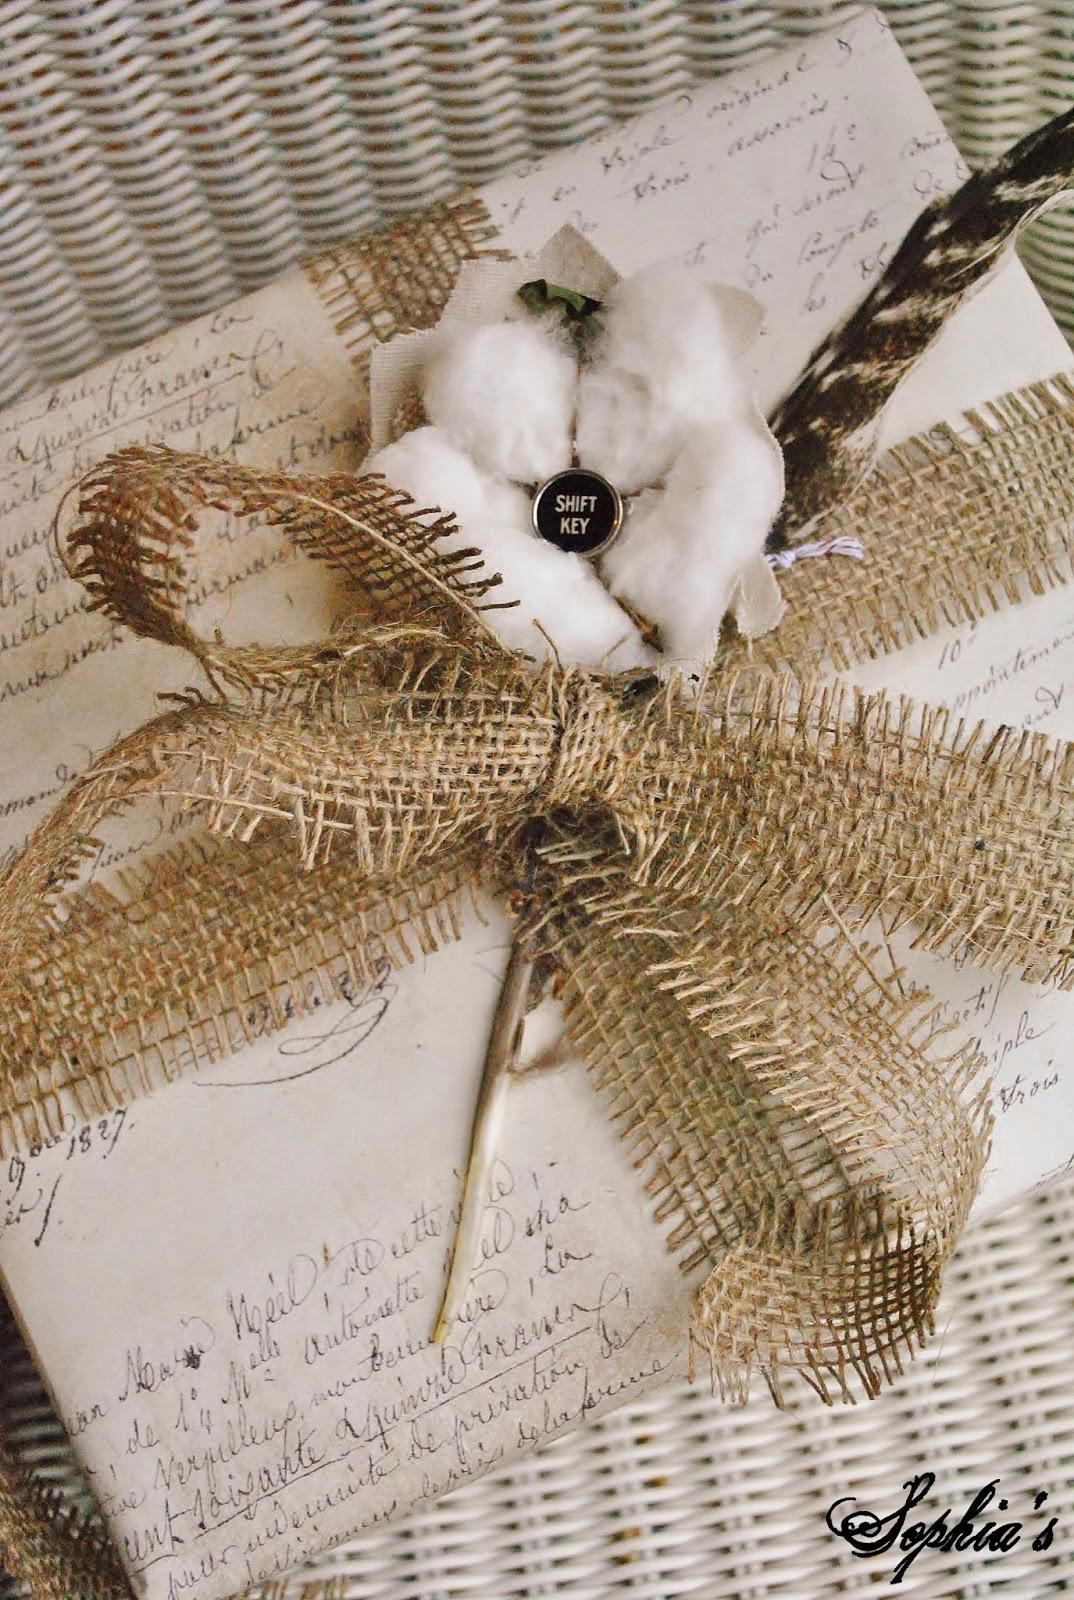 Sophia S The Scoop On Creating A Handmade Christmas